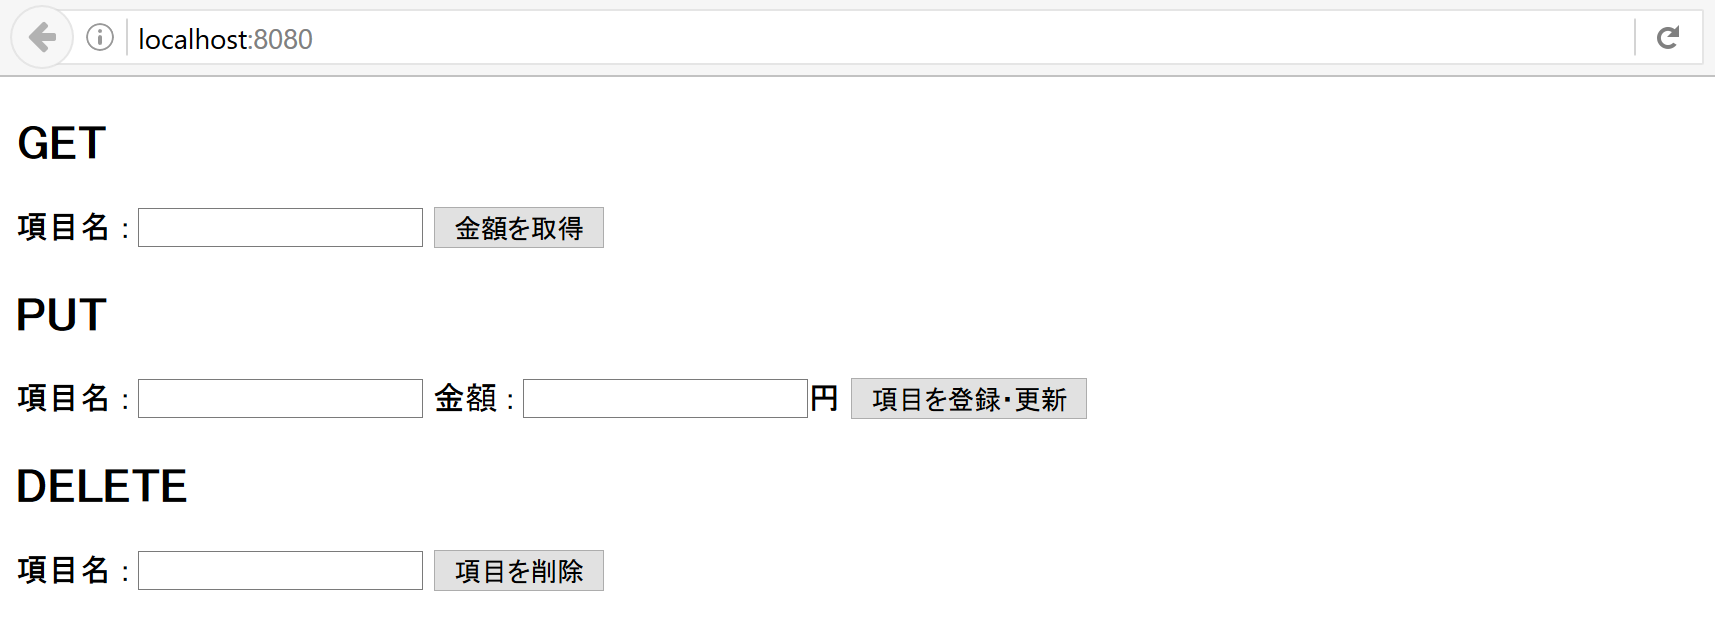 datastore_01.PNG